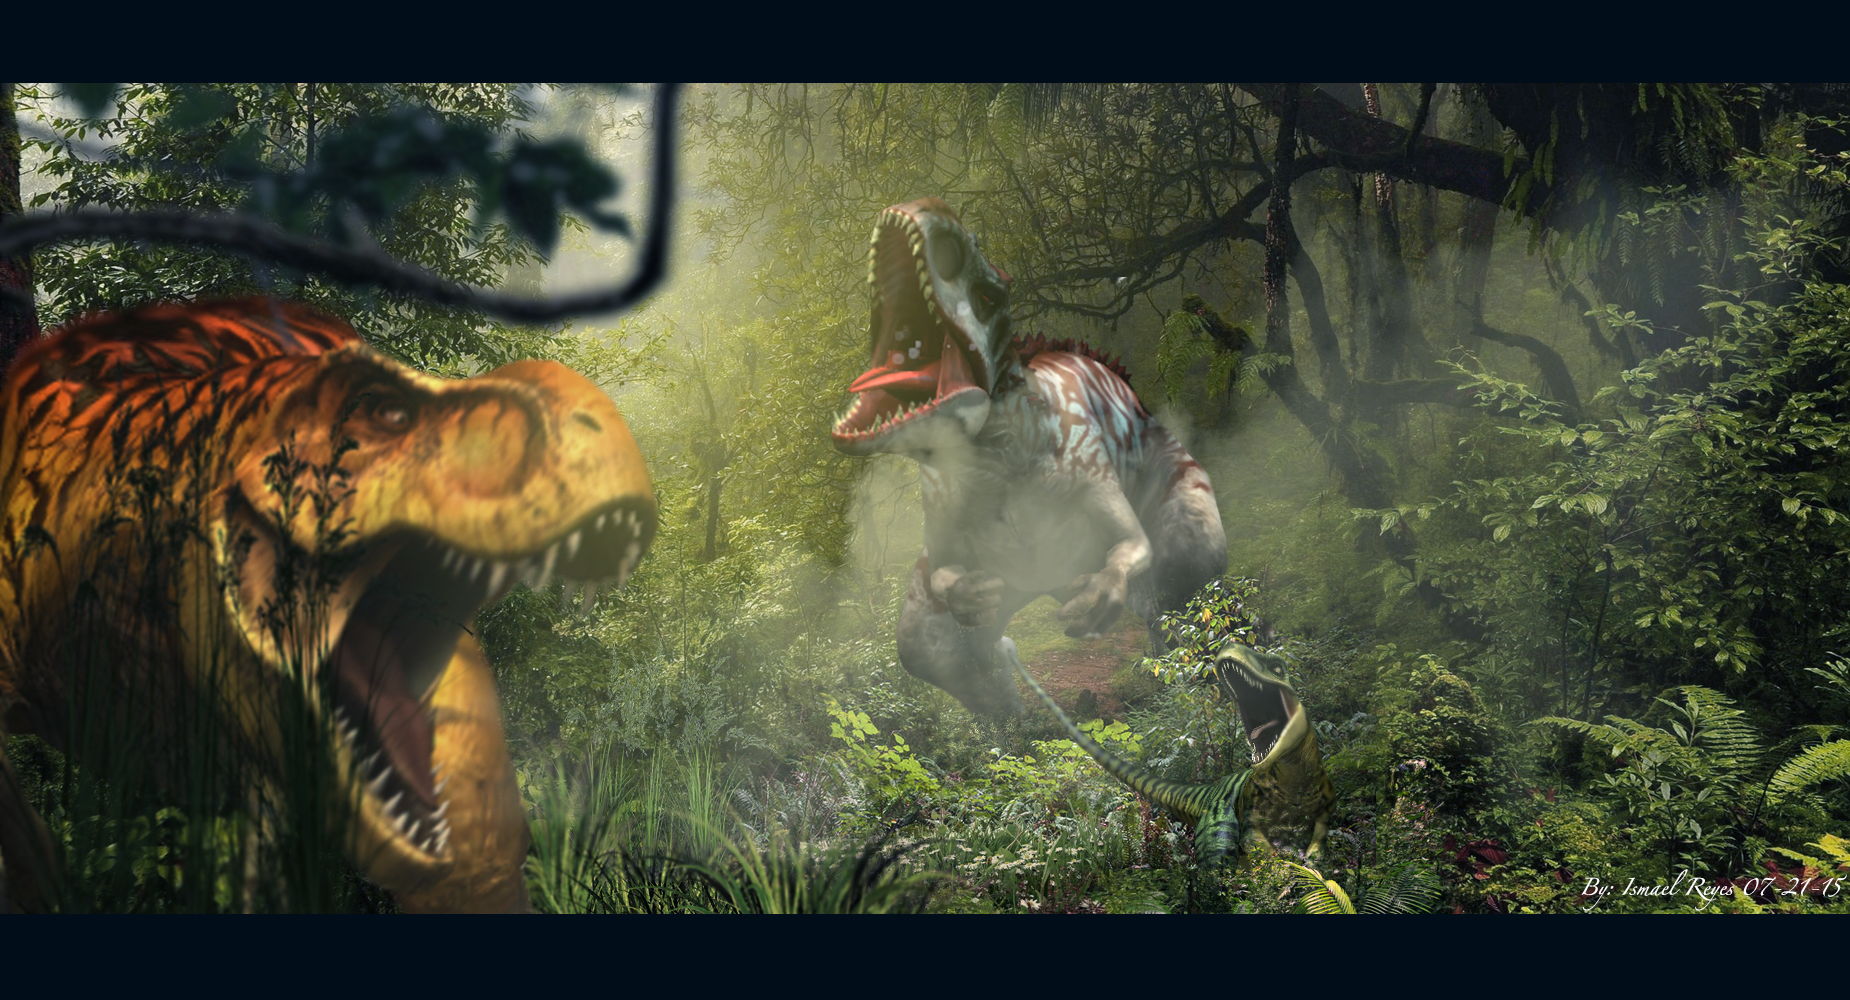 Jurassic World The Game Wallpaper by IResARTS on DeviantArt